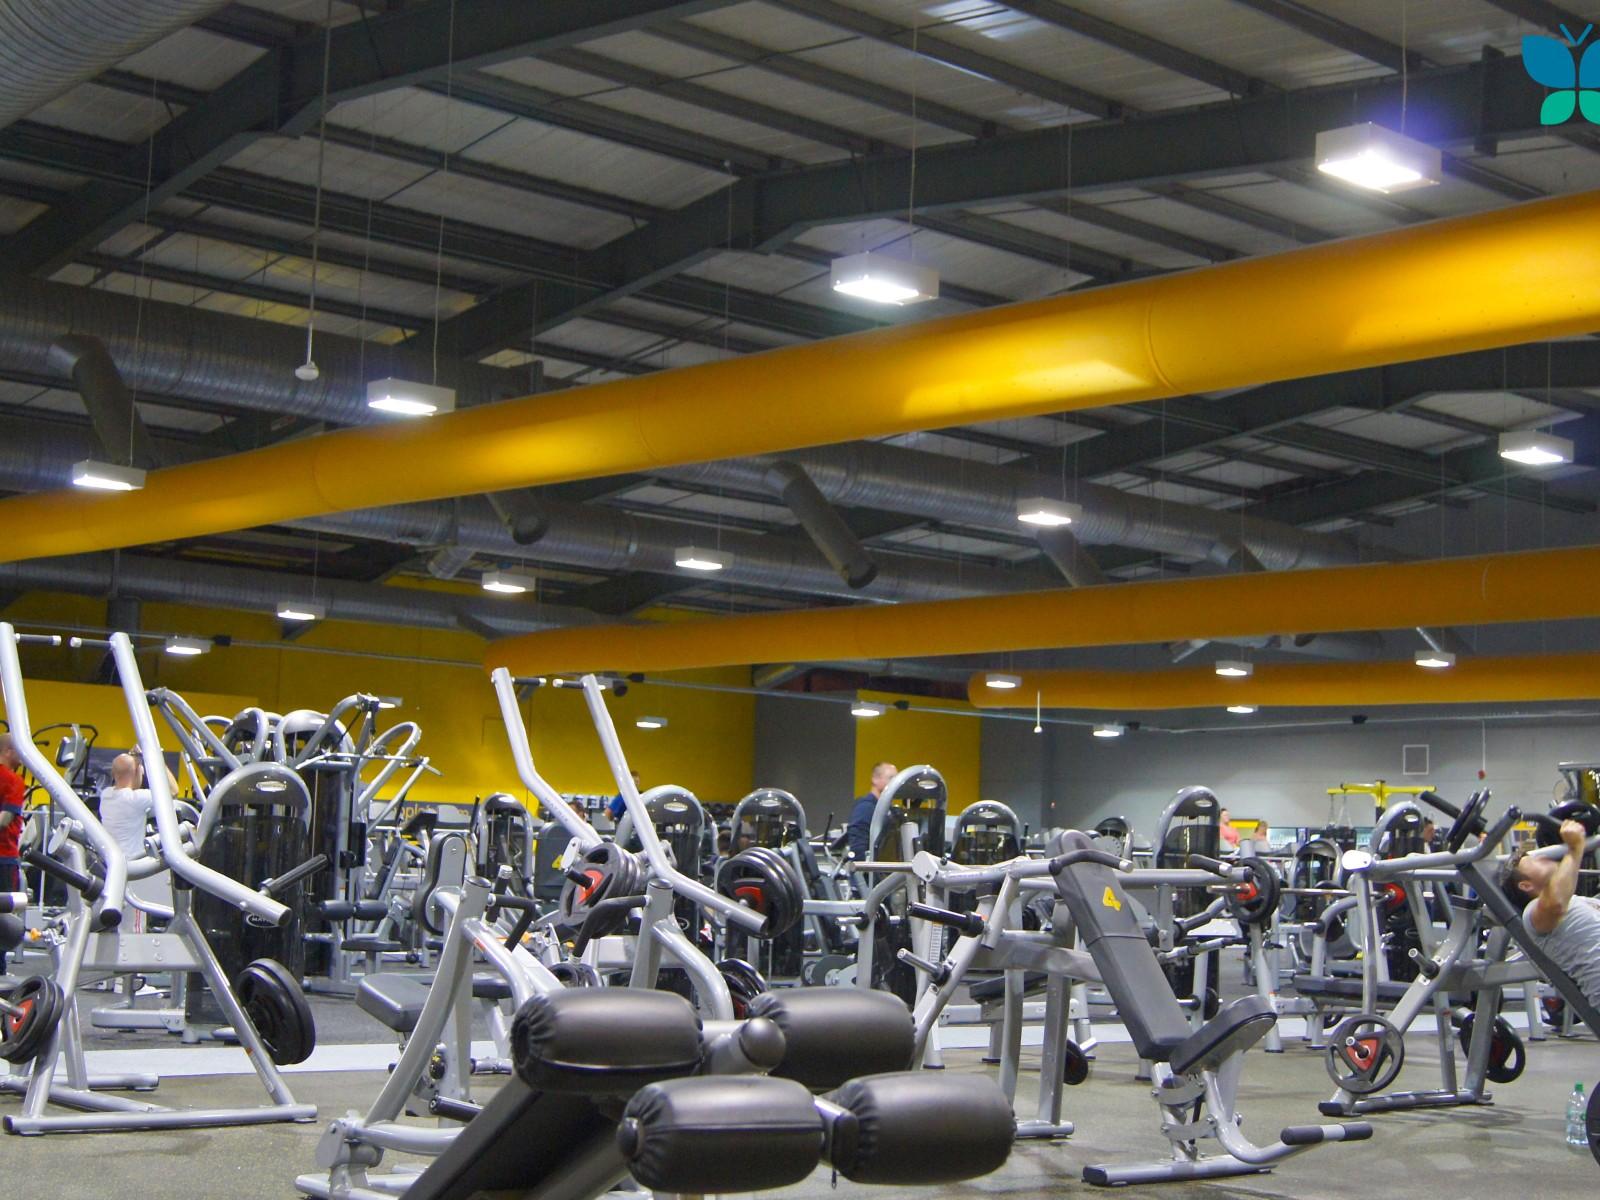 Prihoda Gym Textile Ducting